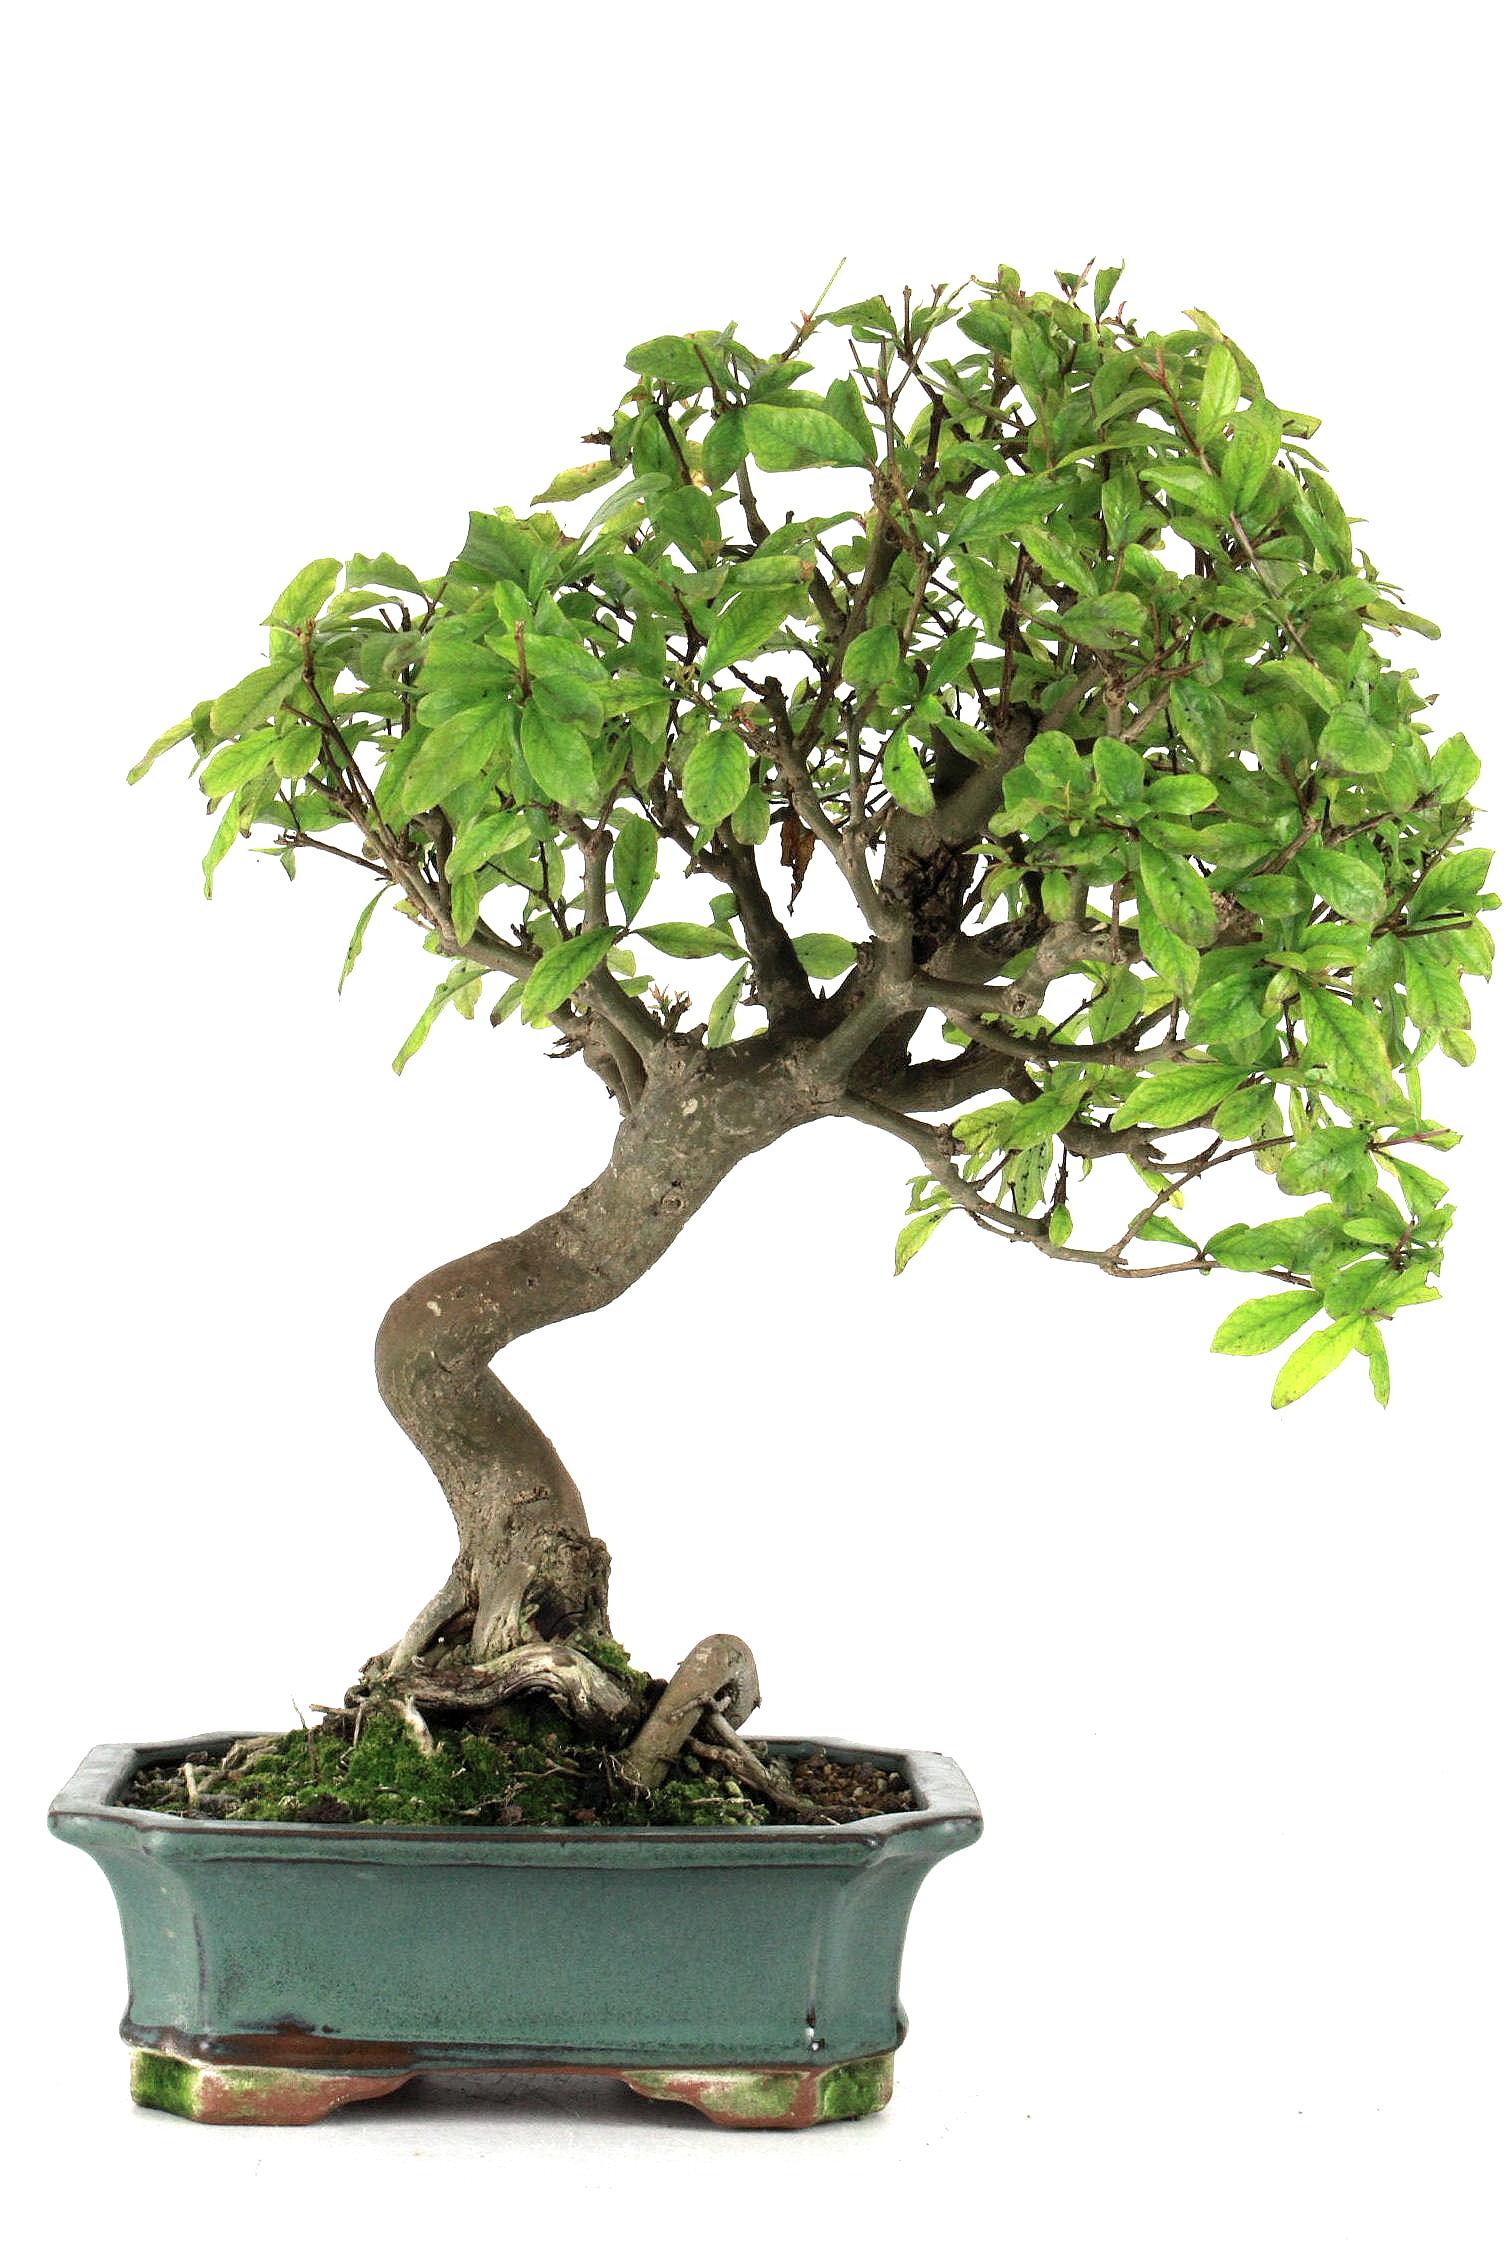 granatapfel 42 cm 194 bei oyaki bonsai kaufen. Black Bedroom Furniture Sets. Home Design Ideas